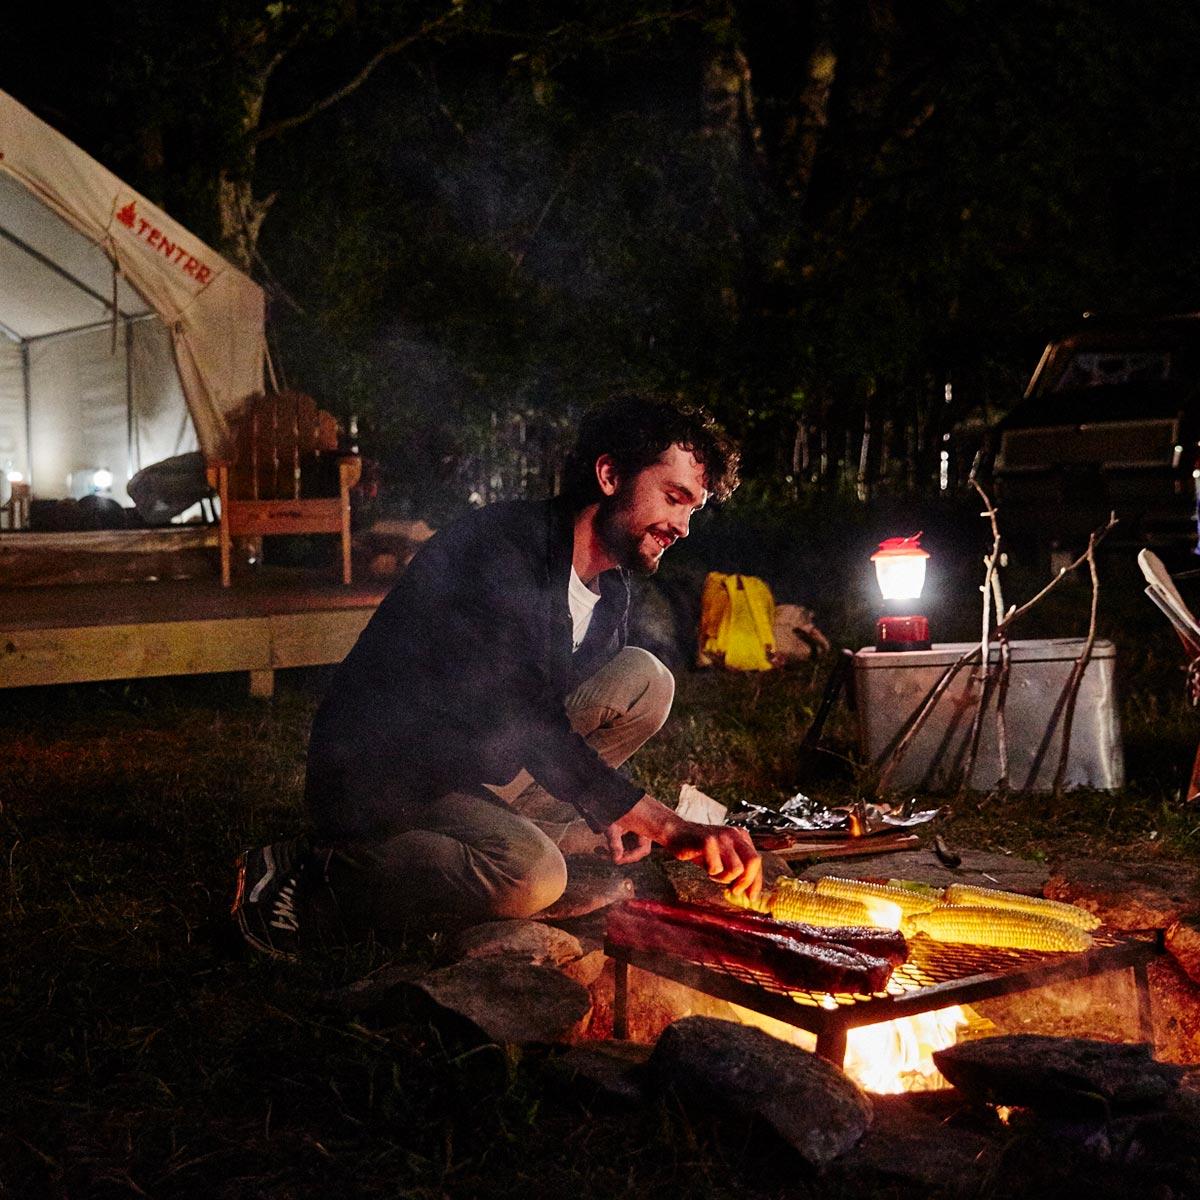 Unique Outdoor Experiences with Tentrr